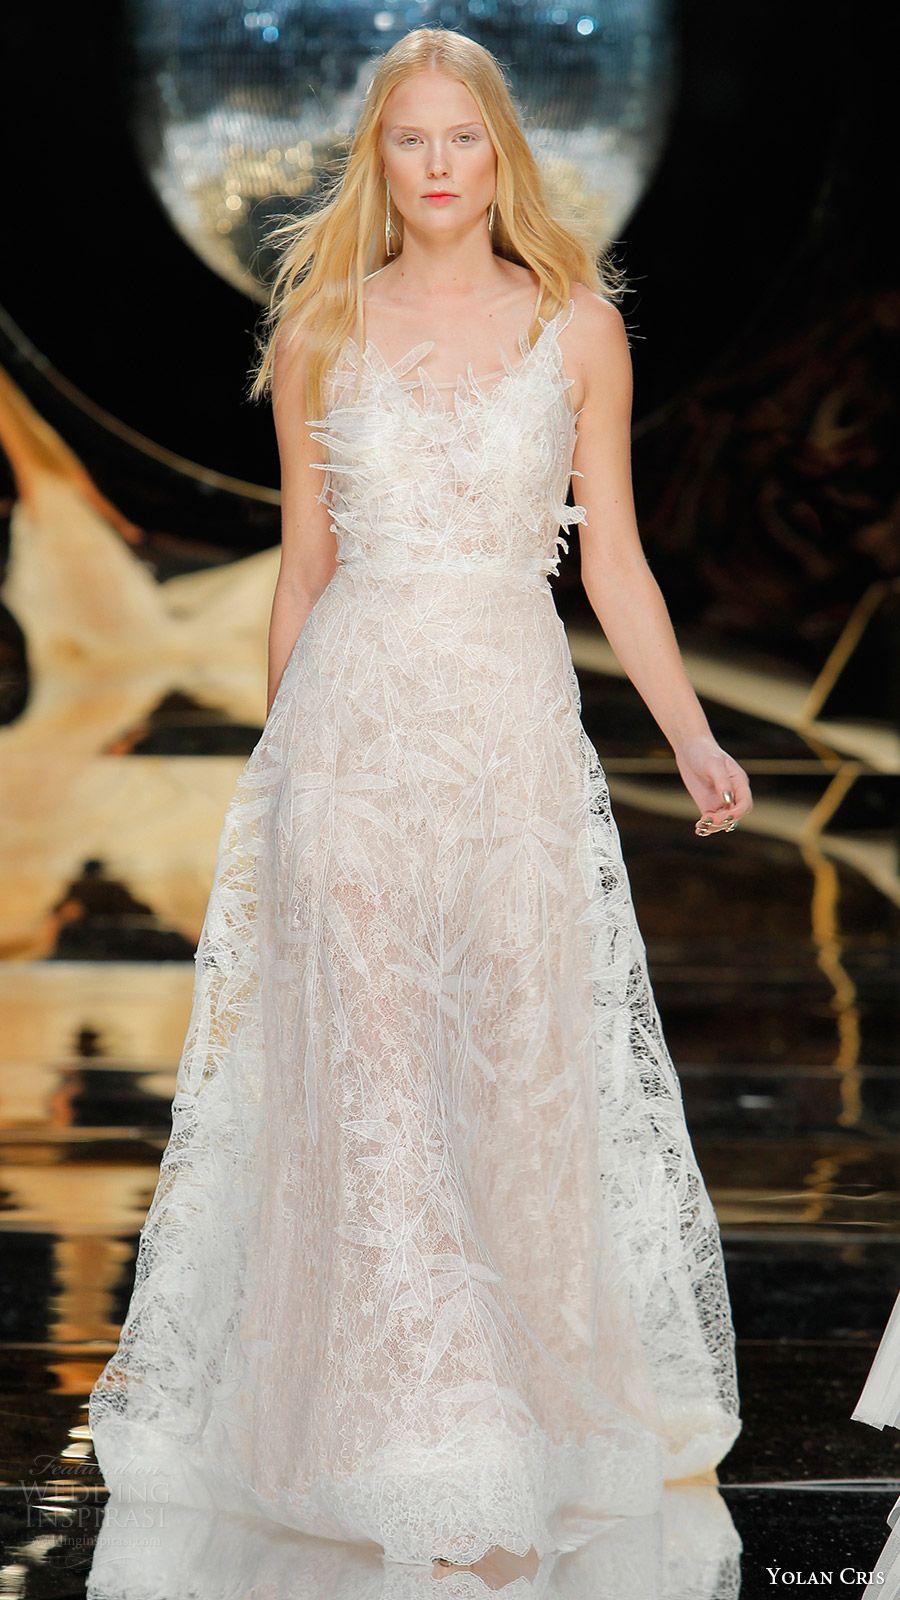 e0cec22afeec yolan cris bridal 2017 sleeveless scoop neck aline wedding dress (29) mv